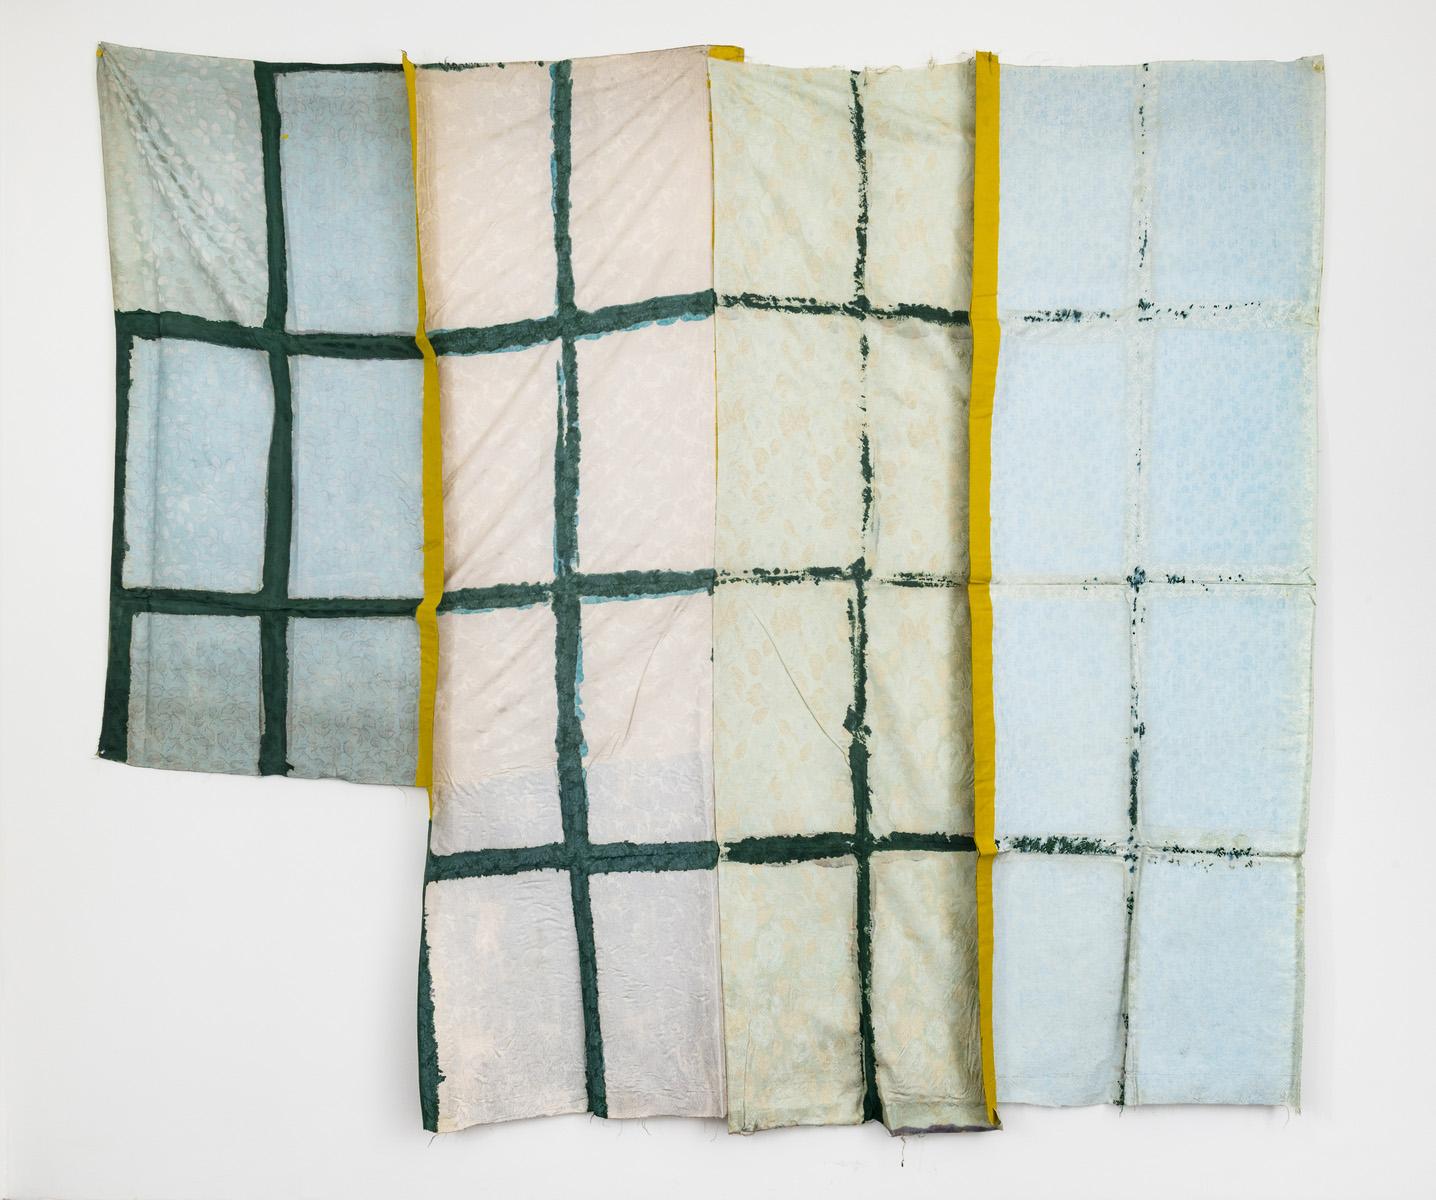 Patrick Saytour (b. 1935), Pliage (Folding), 1974, Tar on fabric, 298 x 298 cm/117.32 x 117.32 in.Image courtesy of Ceysson & Bénétière ©